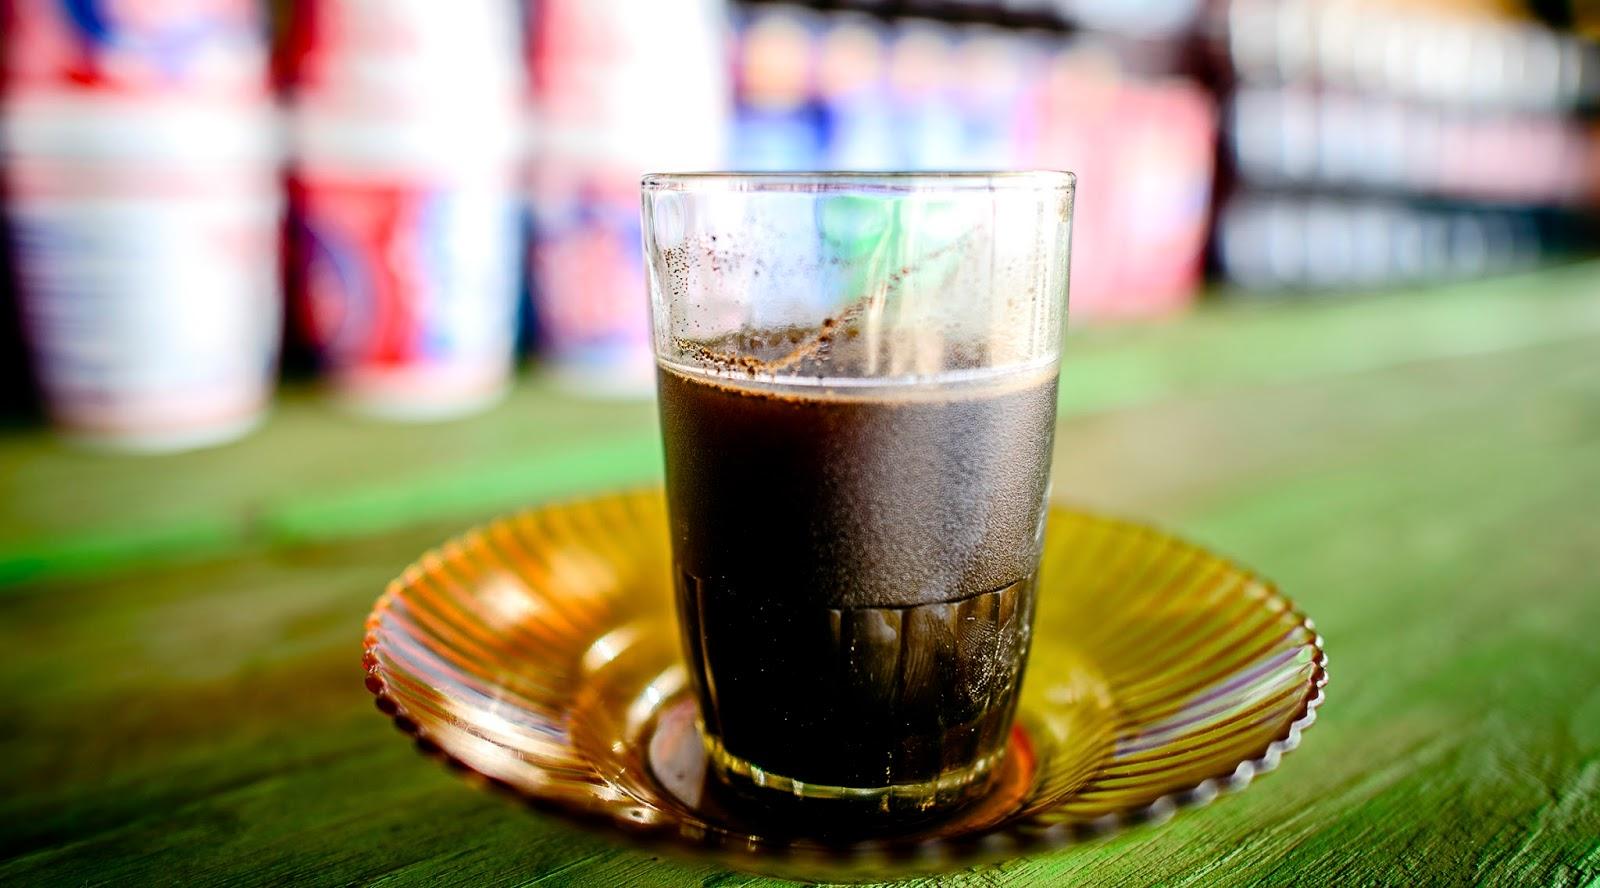 Kopi hitam paling enak dan lezat warkop paling murah nyaman terbaik jual biji kopi makassar dan manis supaya saya laku tolongka ayah dak sanggupki otakku